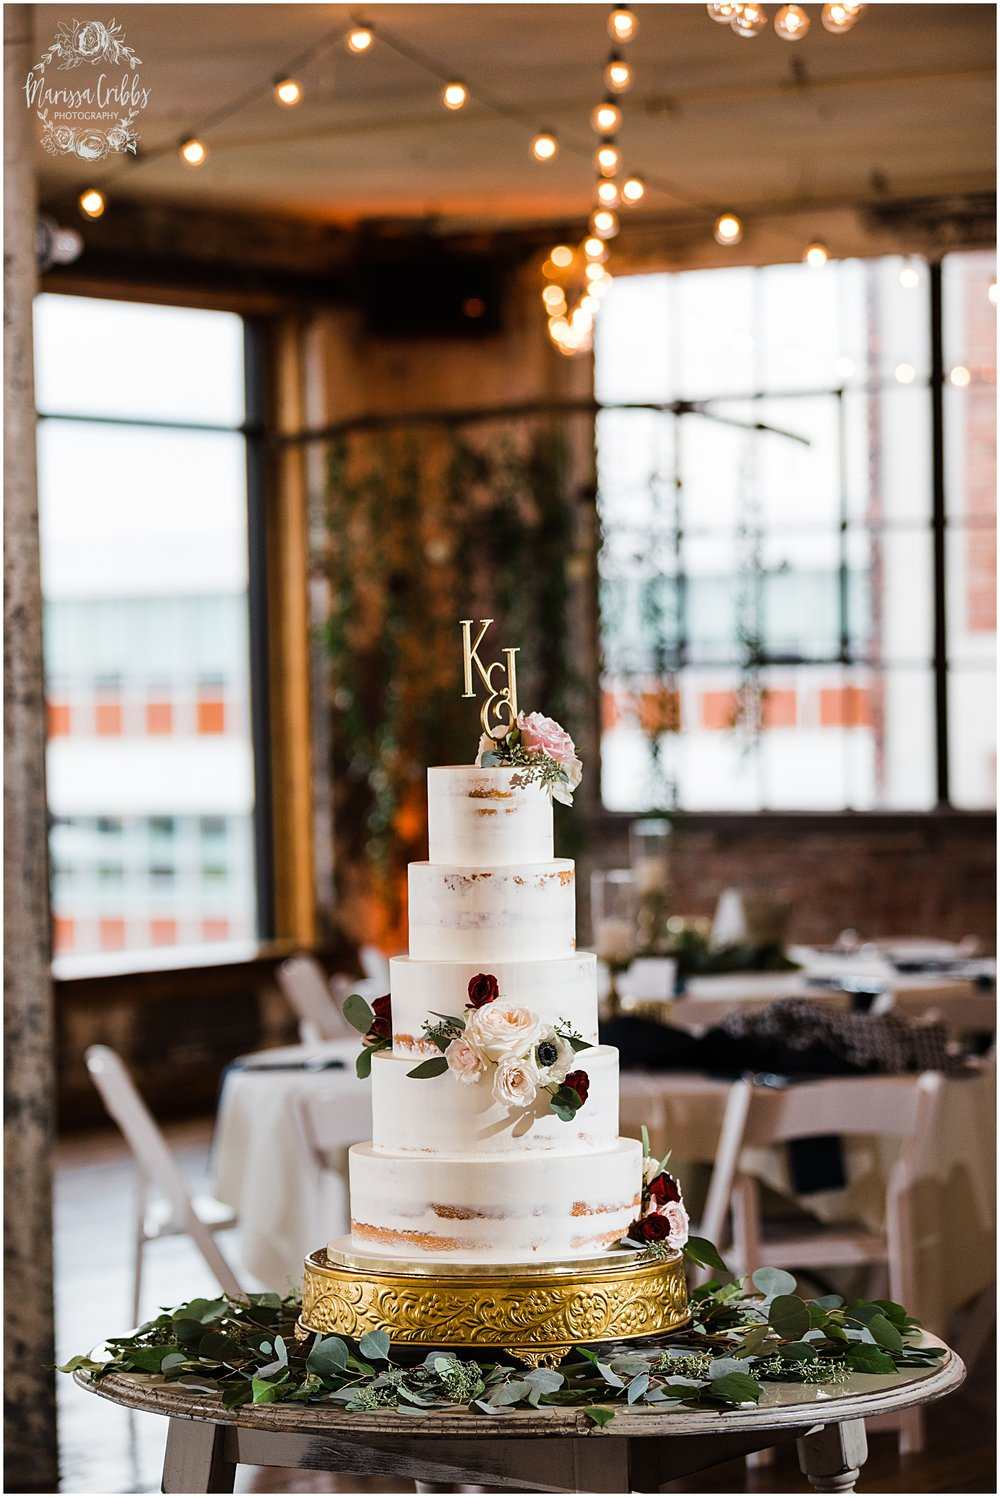 BAUER WEDDING | KELSEA & JUSTIN | MARISSA CRIBBS PHOTOGRAPHY_6573.jpg